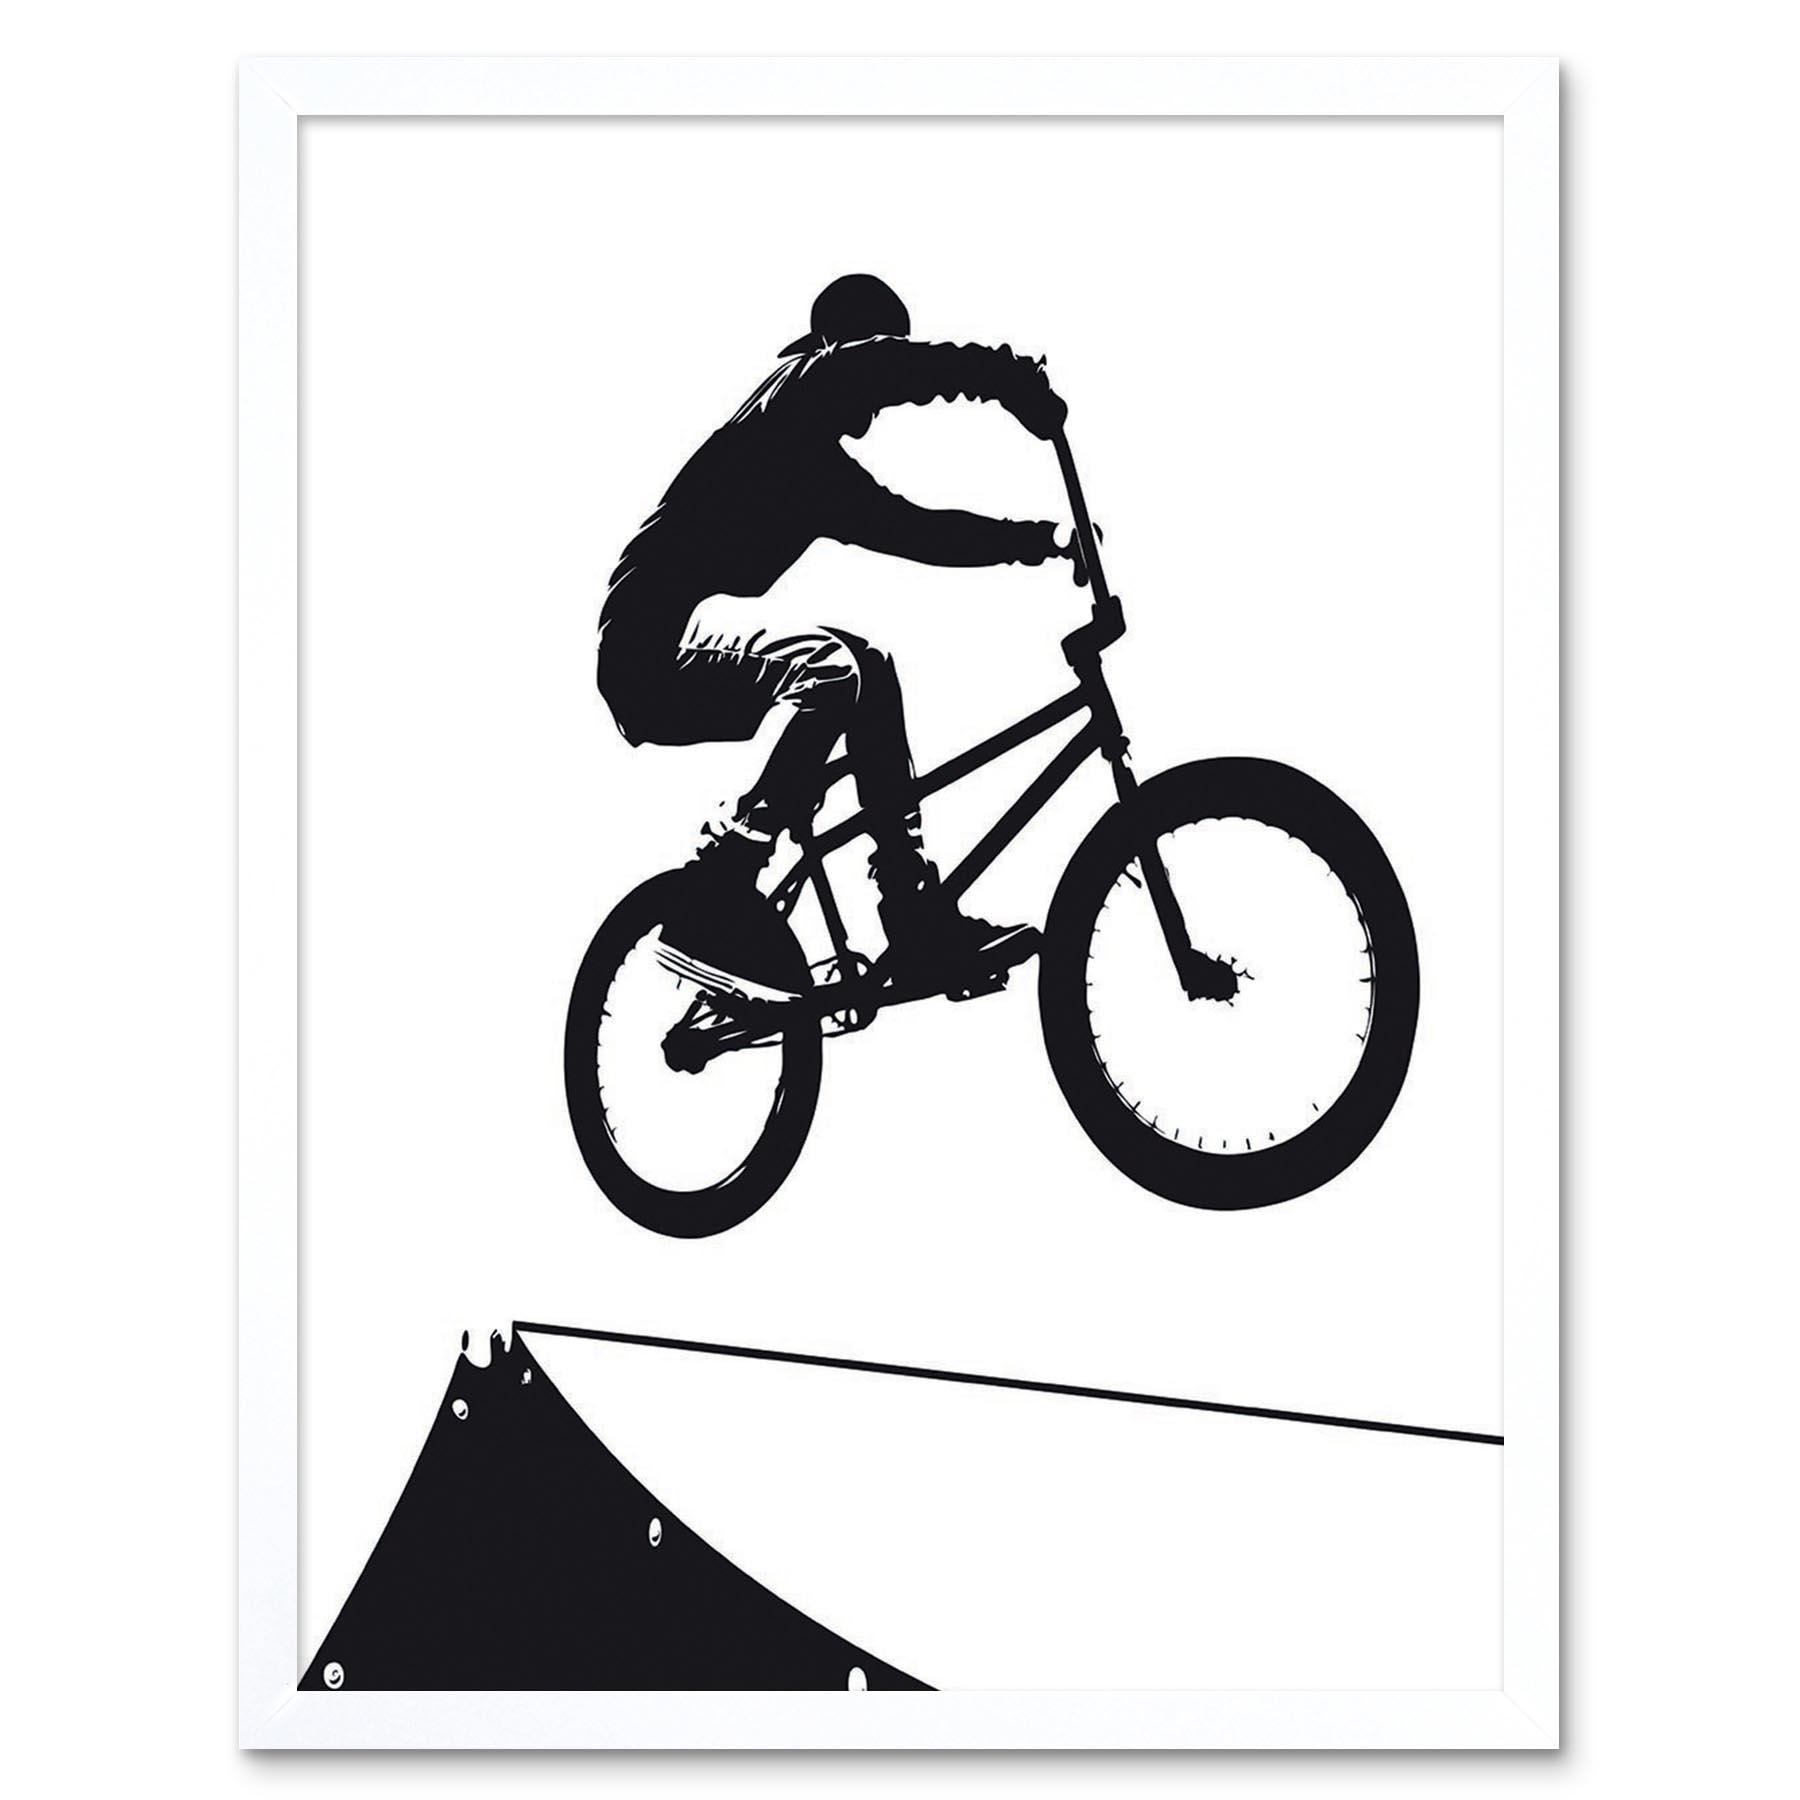 Indexbild 17 - Painting Sport Bmx Bike Bicycle Jump Air Ramp Black White 12X16 Framed Art Print